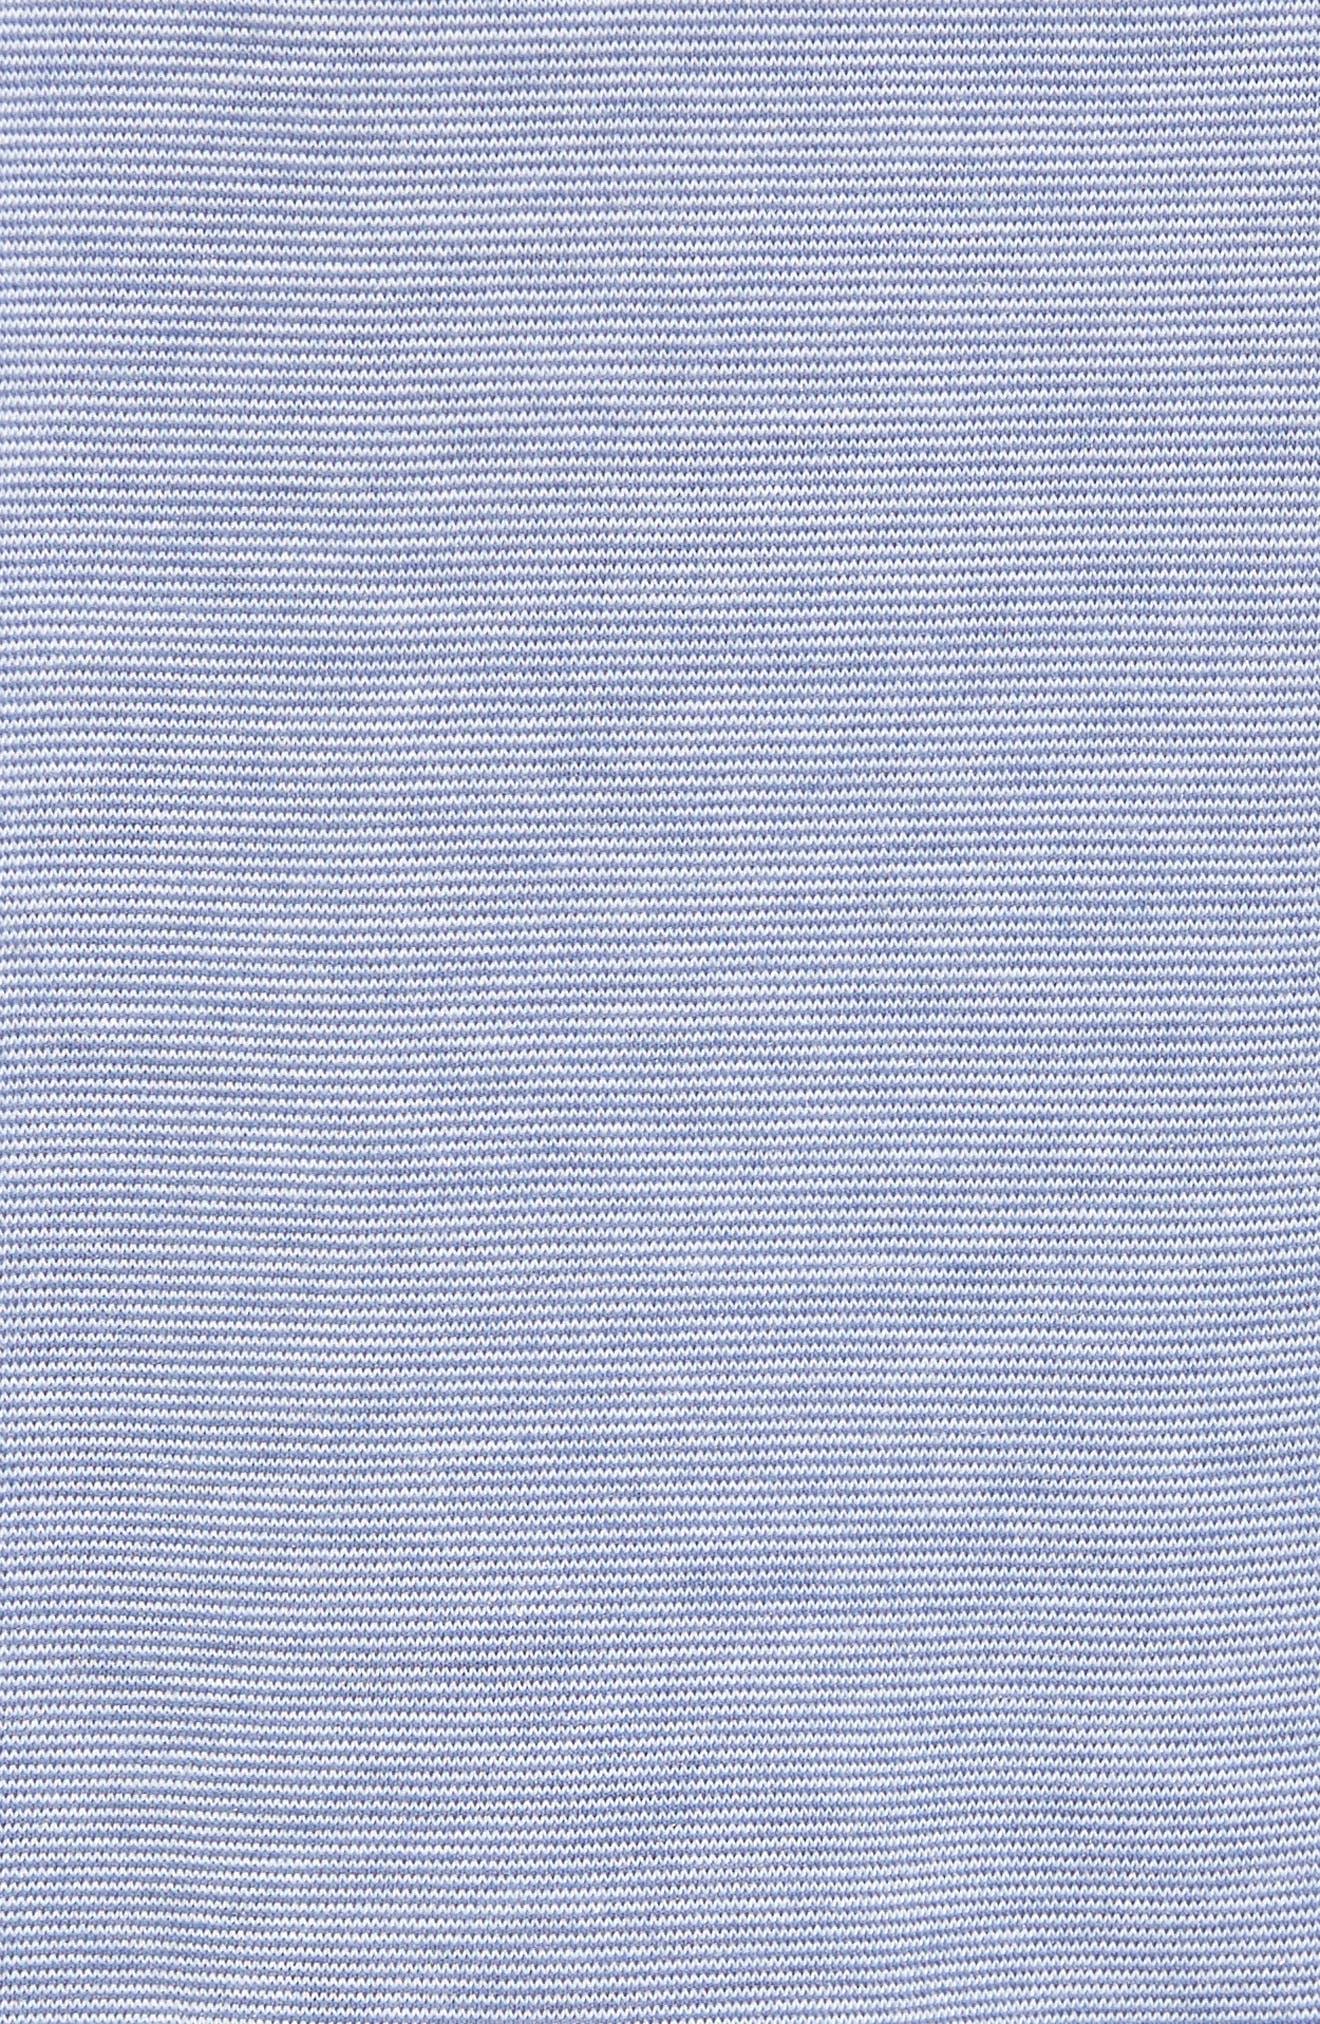 Pima Cotton & Modal Lounge Shorts,                             Alternate thumbnail 5, color,                             Blue/ Ivory